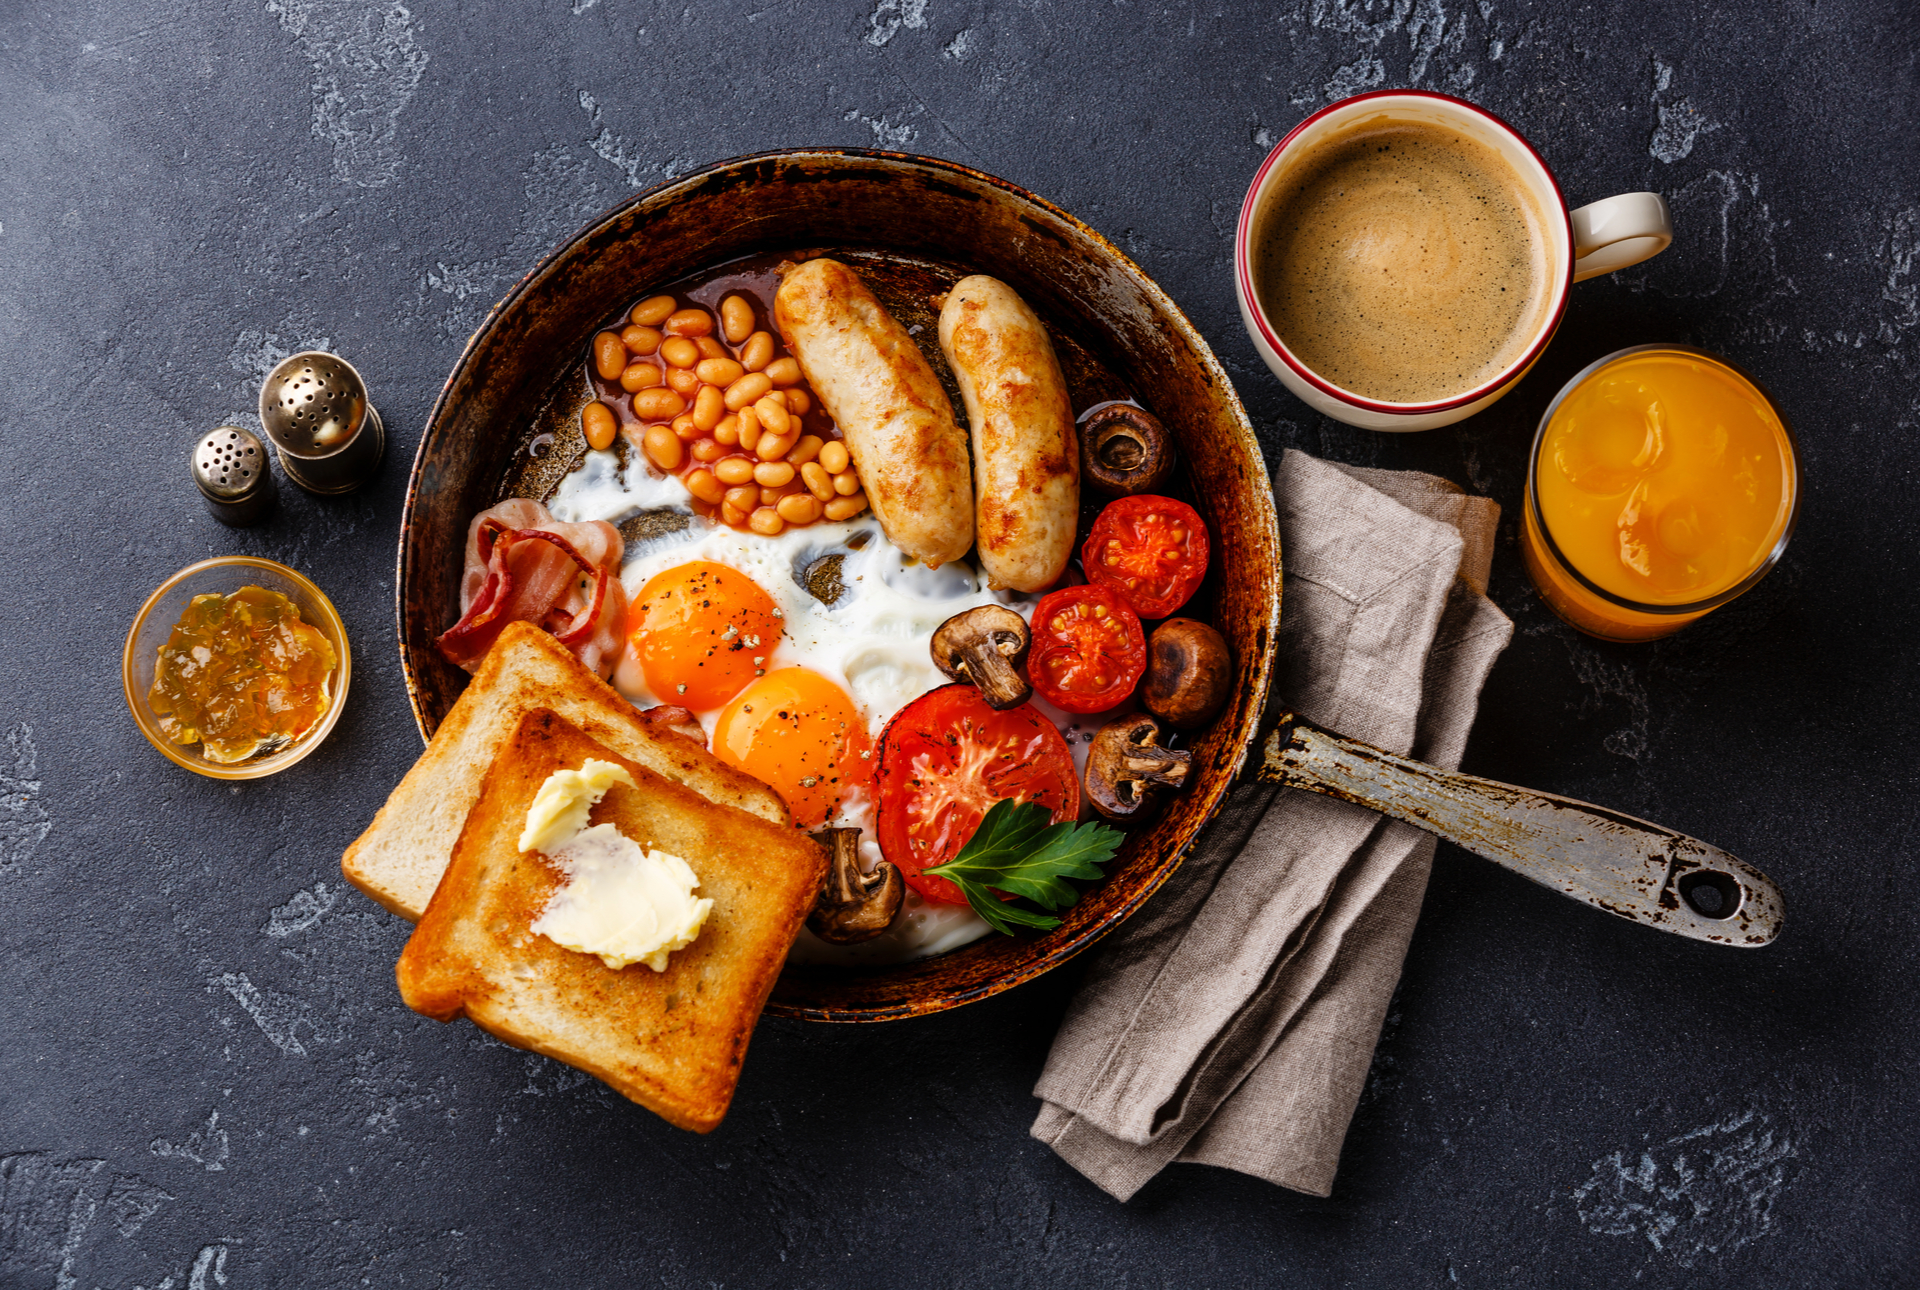 Hot breakfast month